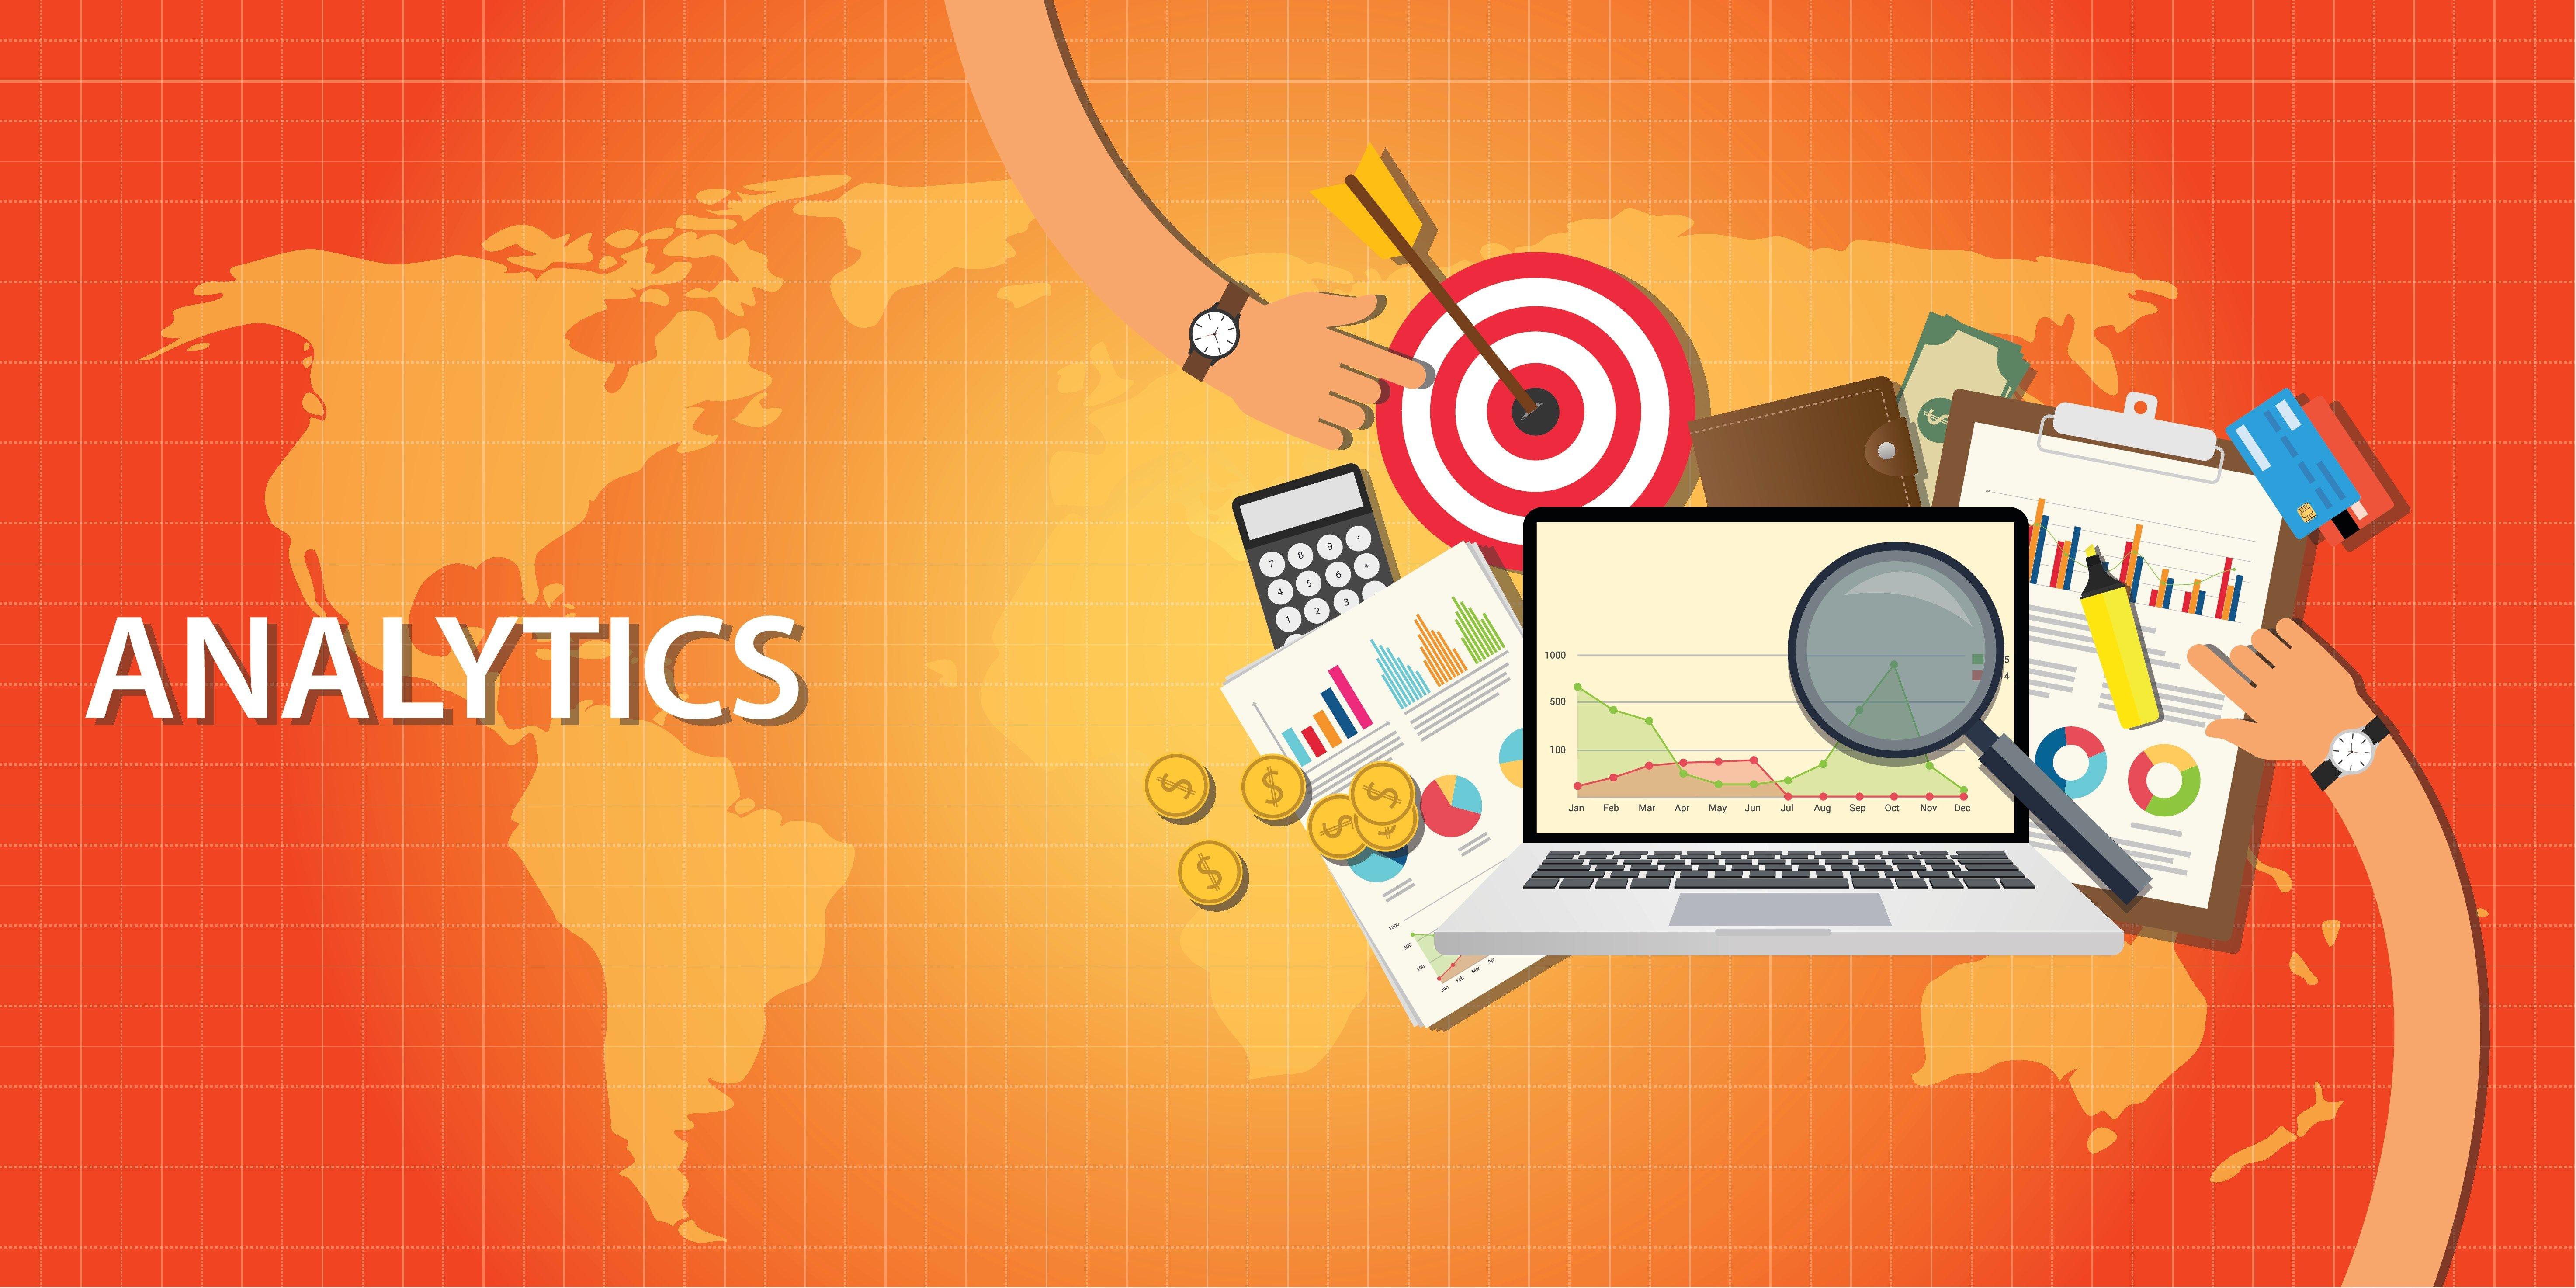 website analytics, analyzing websites with analytics, web portals